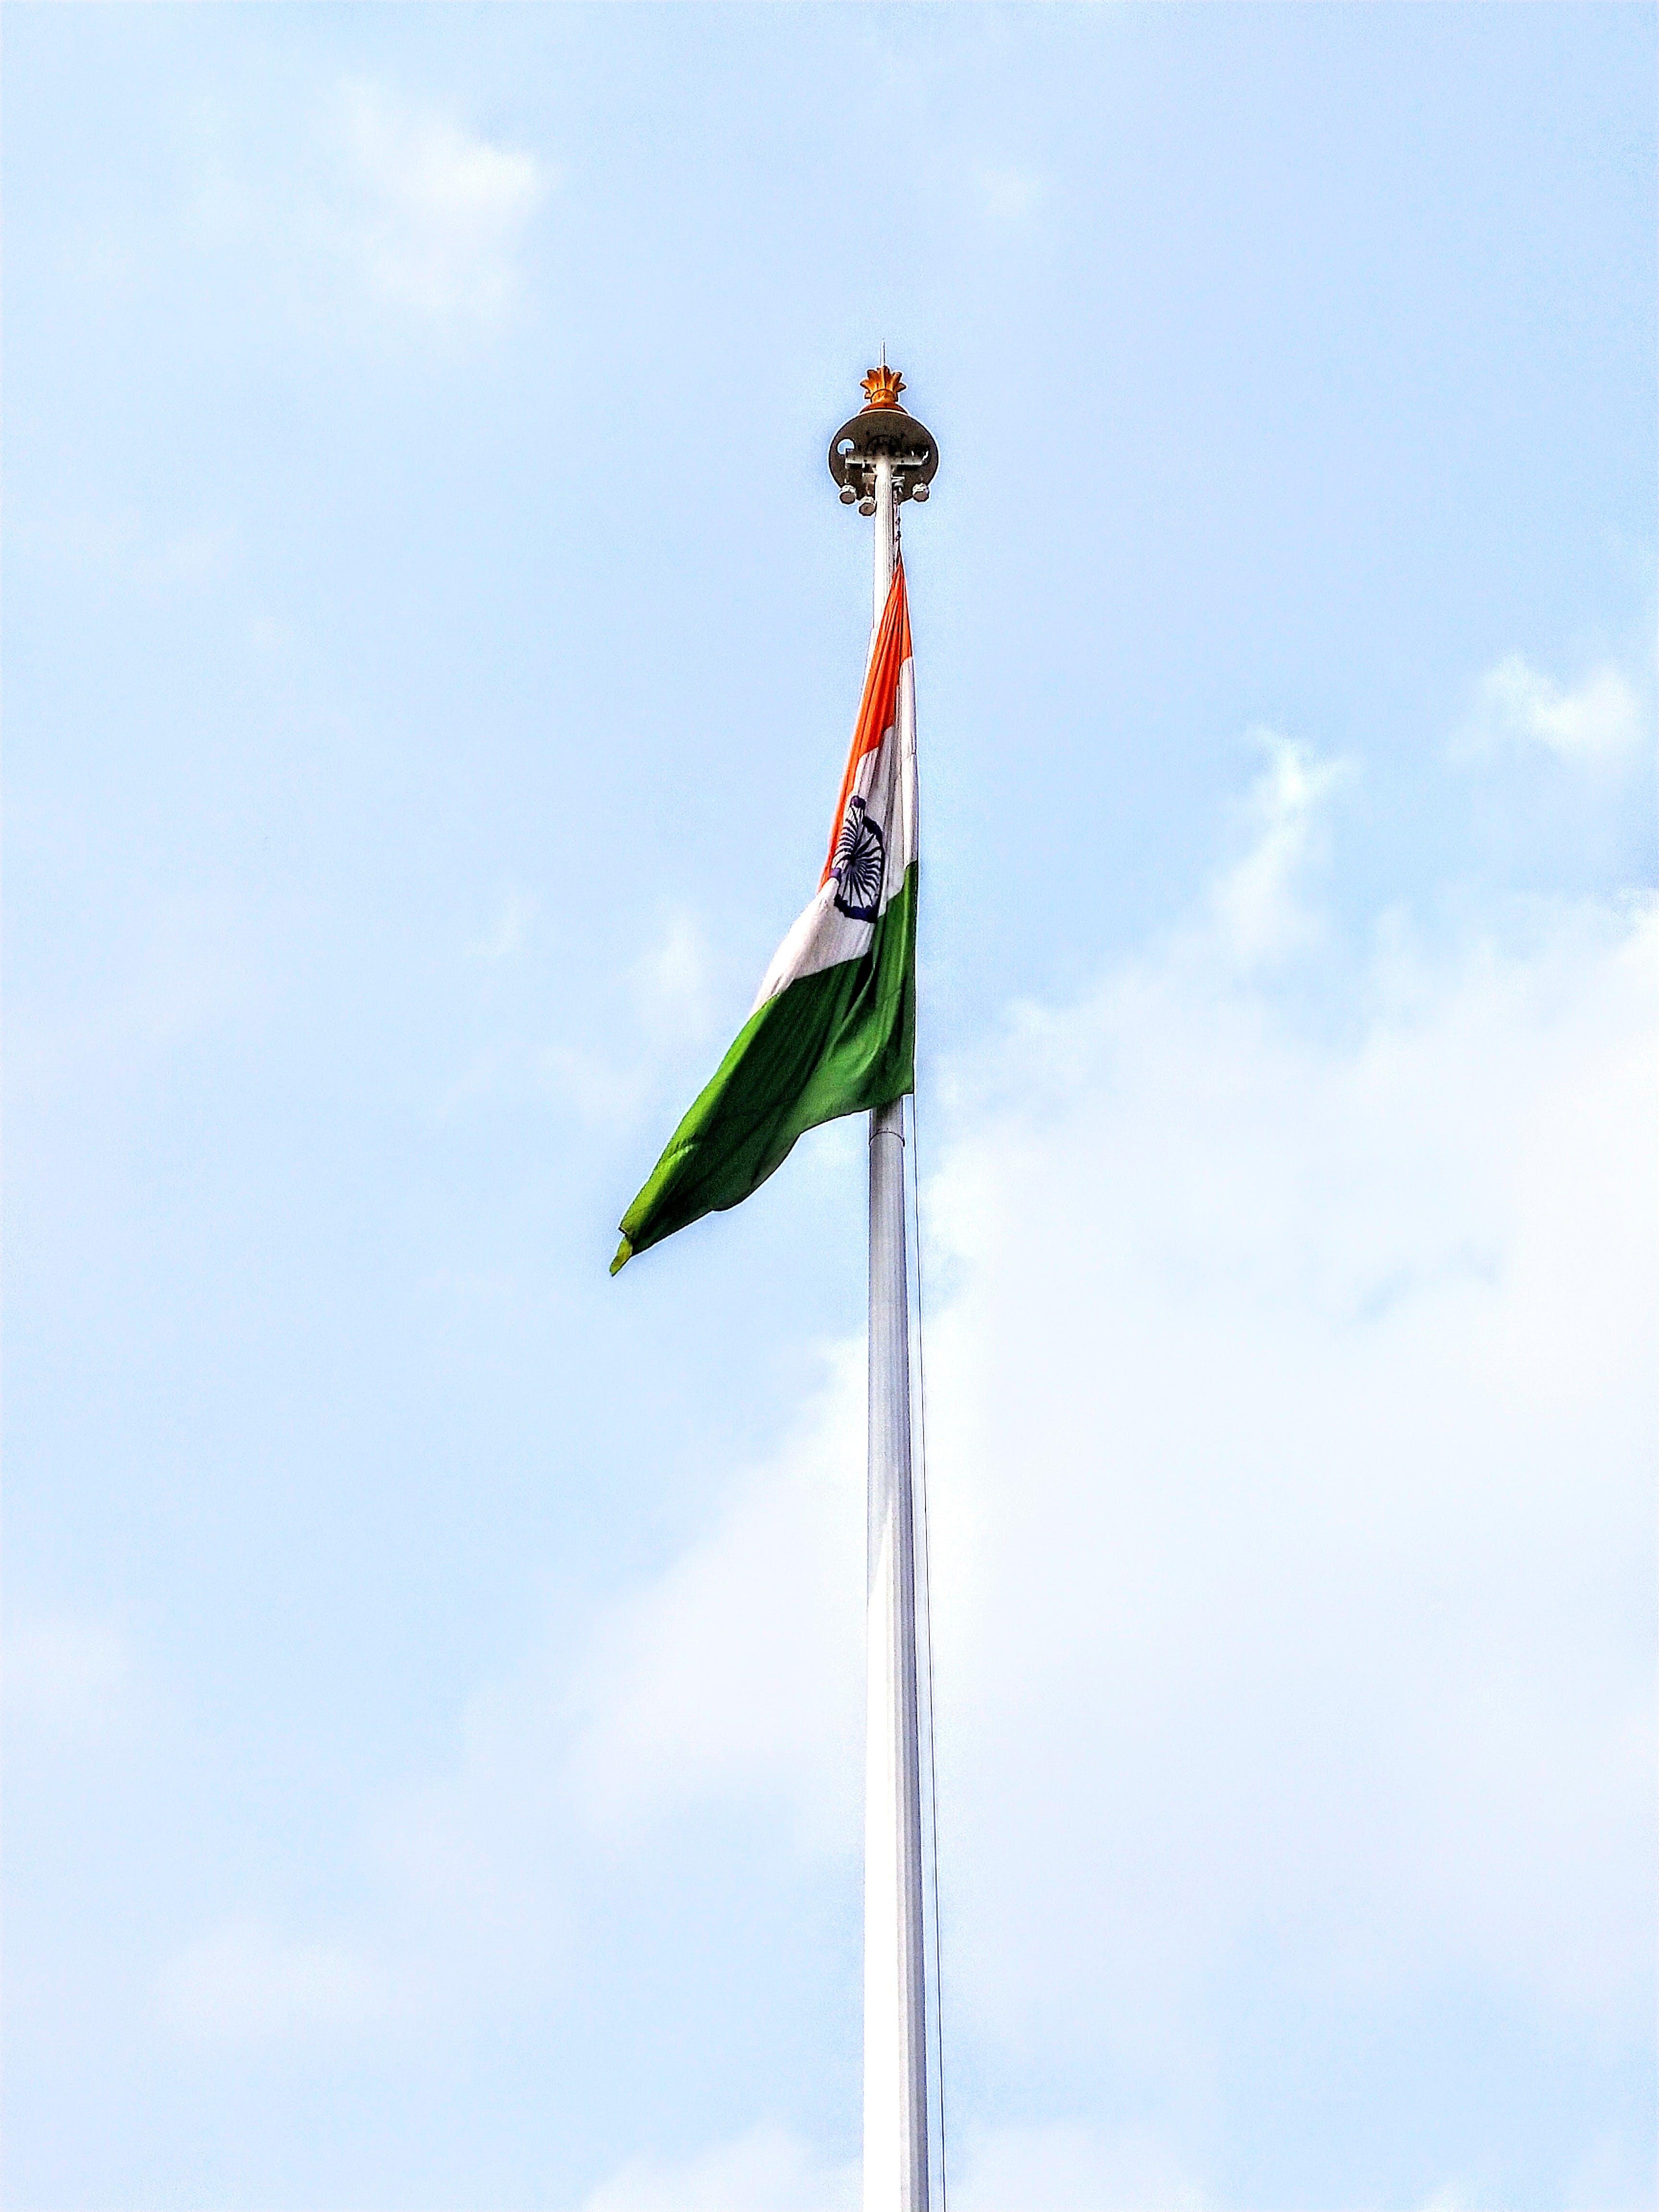 Free stock photo of Flagpillar ranchi, indian tradition, indianflag, national flag